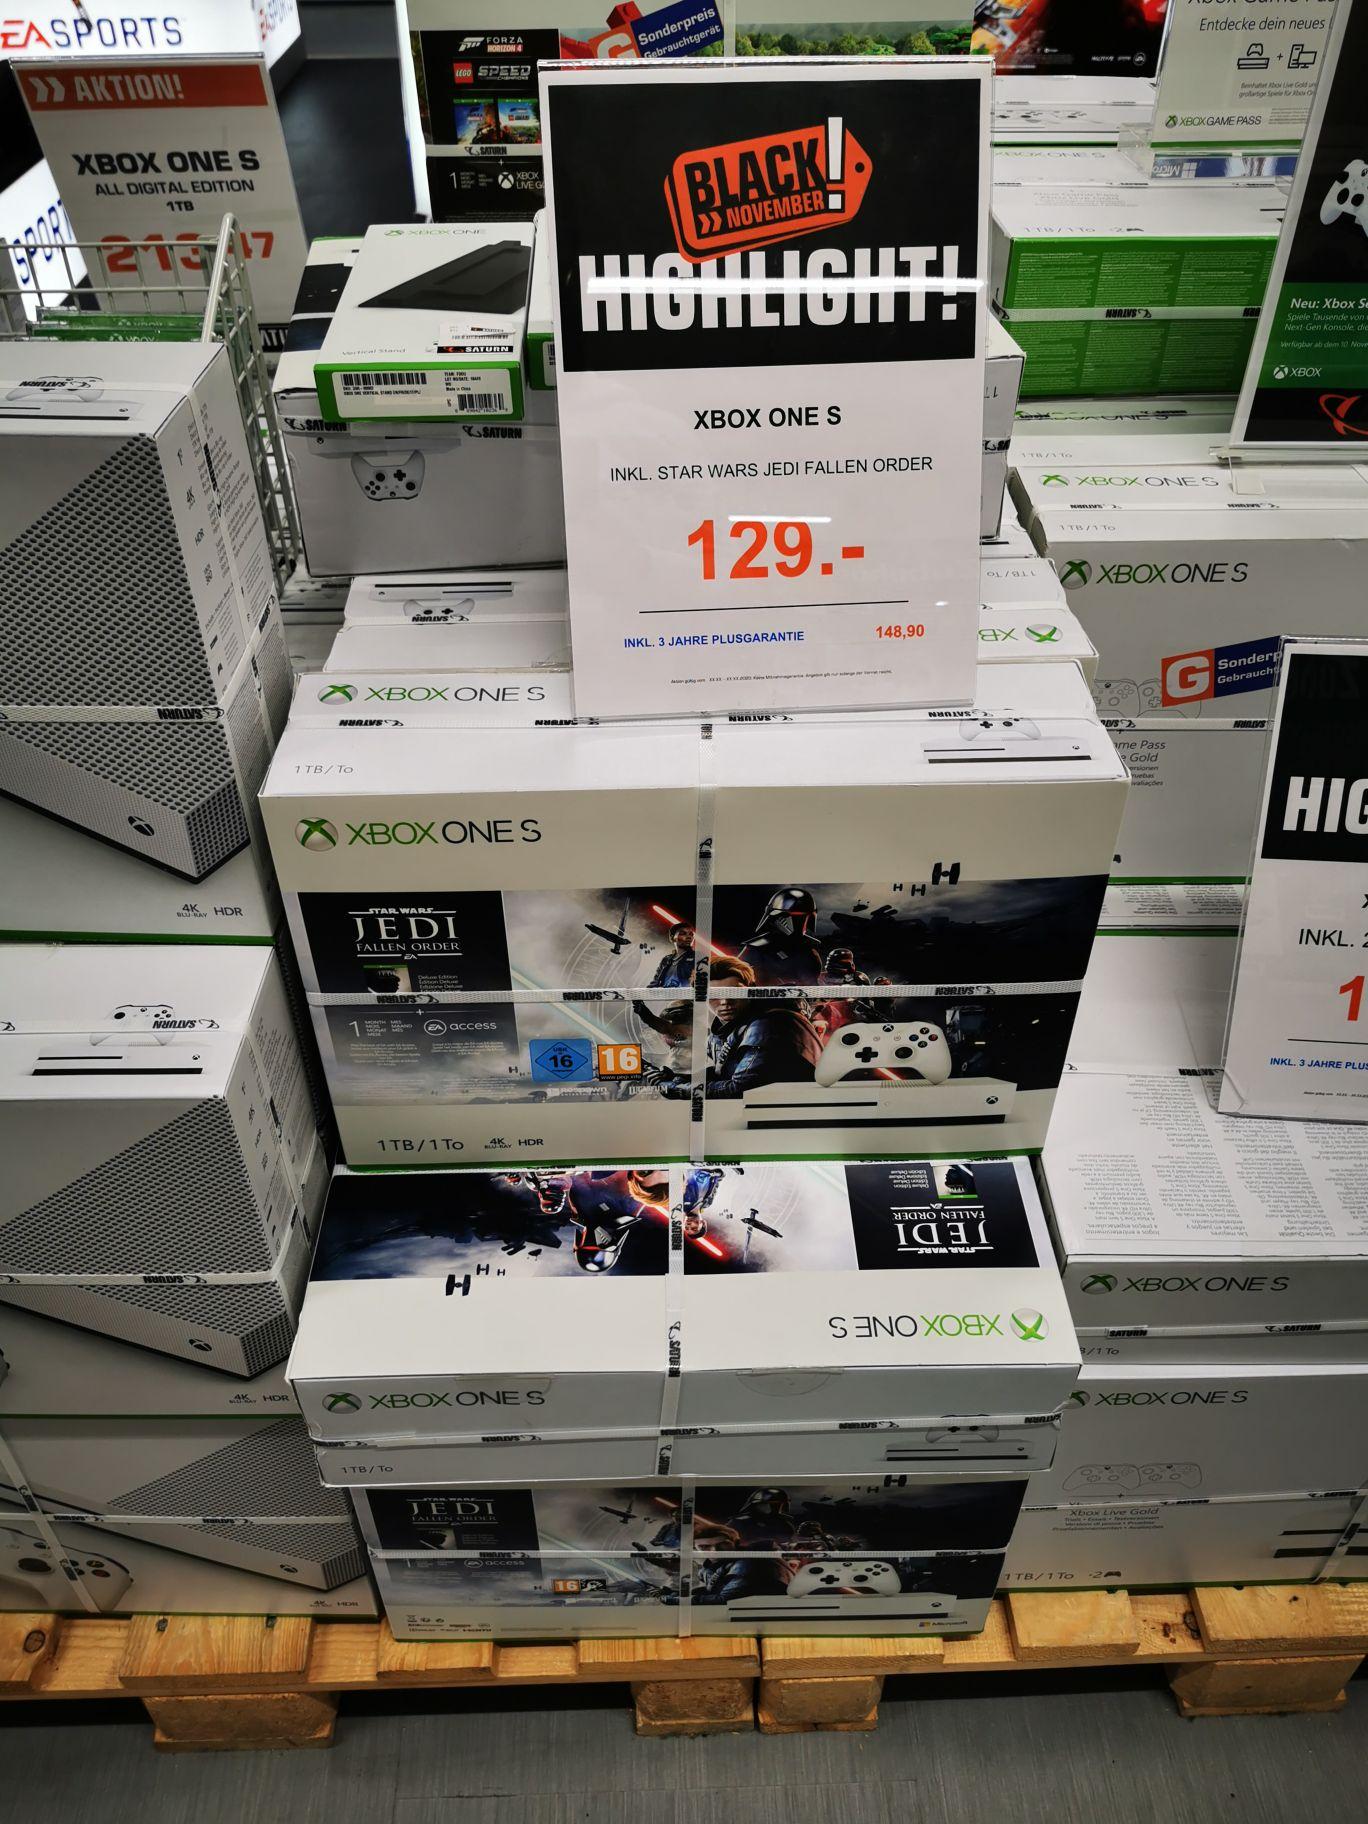 Lokal Saturn Köln City - Xbox one s 1tb mit jedi fallen order ODER mit 2tem controller